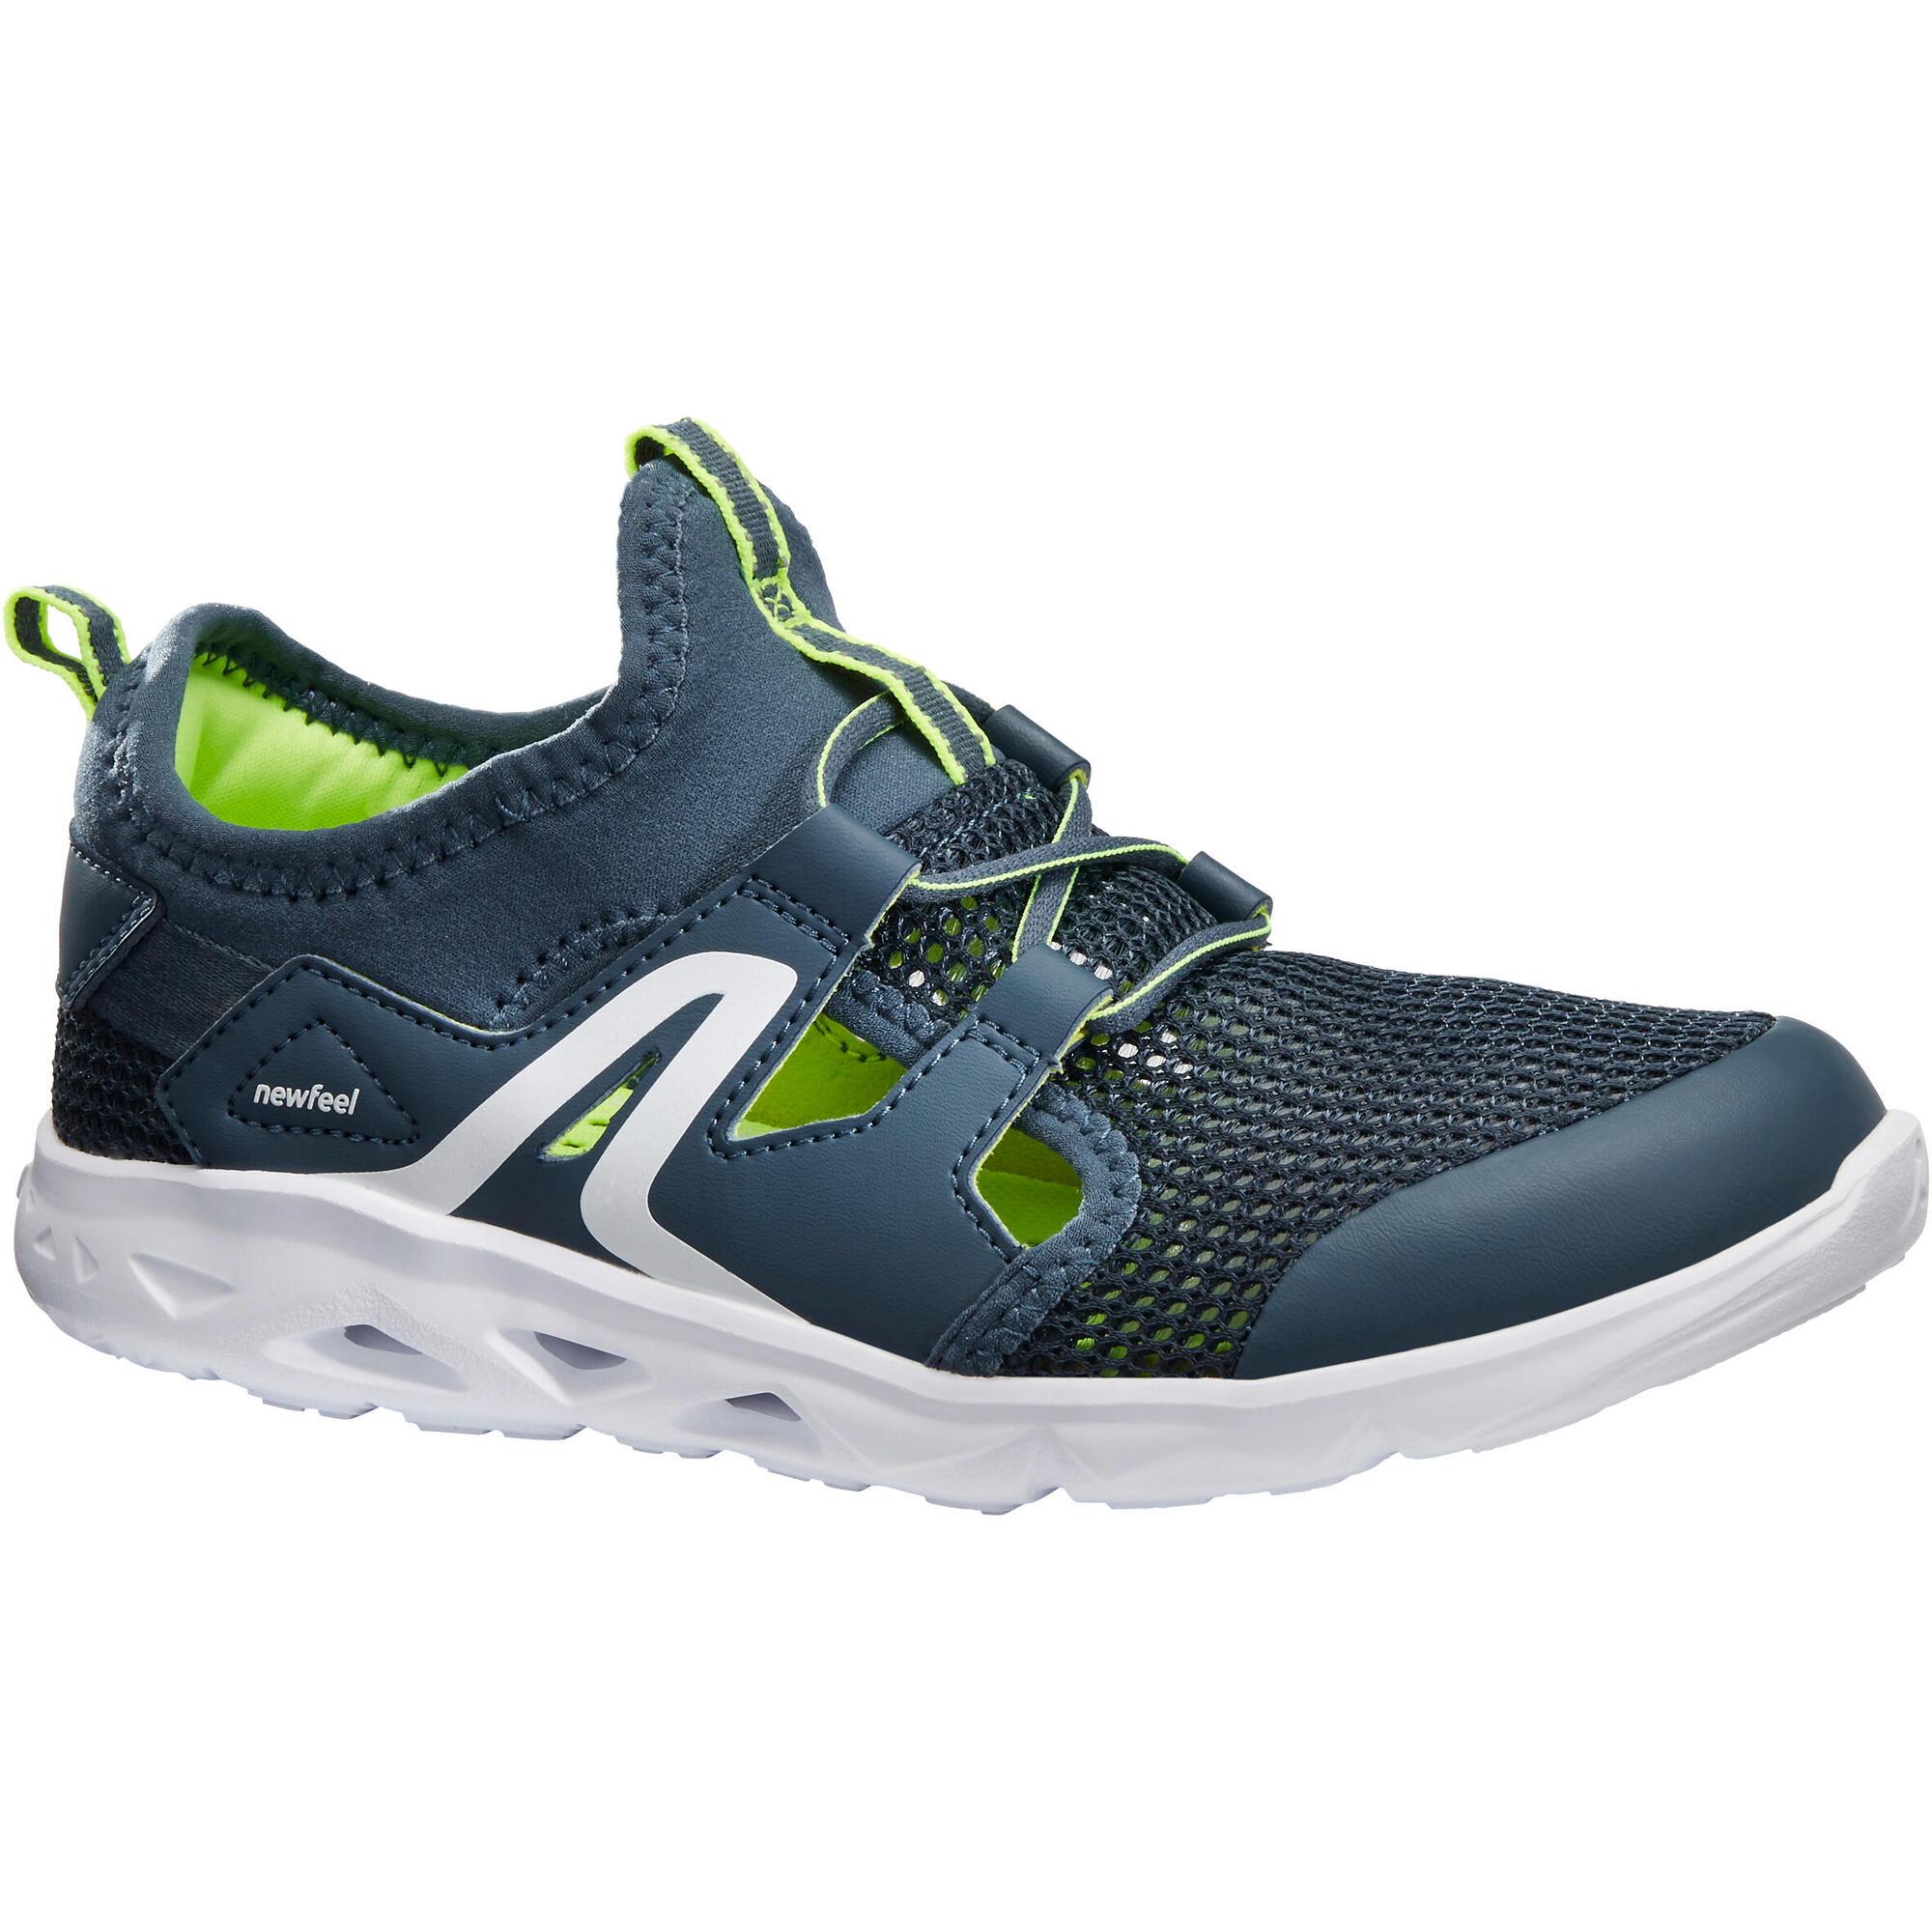 chaussures marche sportive enfant pw 500 fresh gris vert. Black Bedroom Furniture Sets. Home Design Ideas